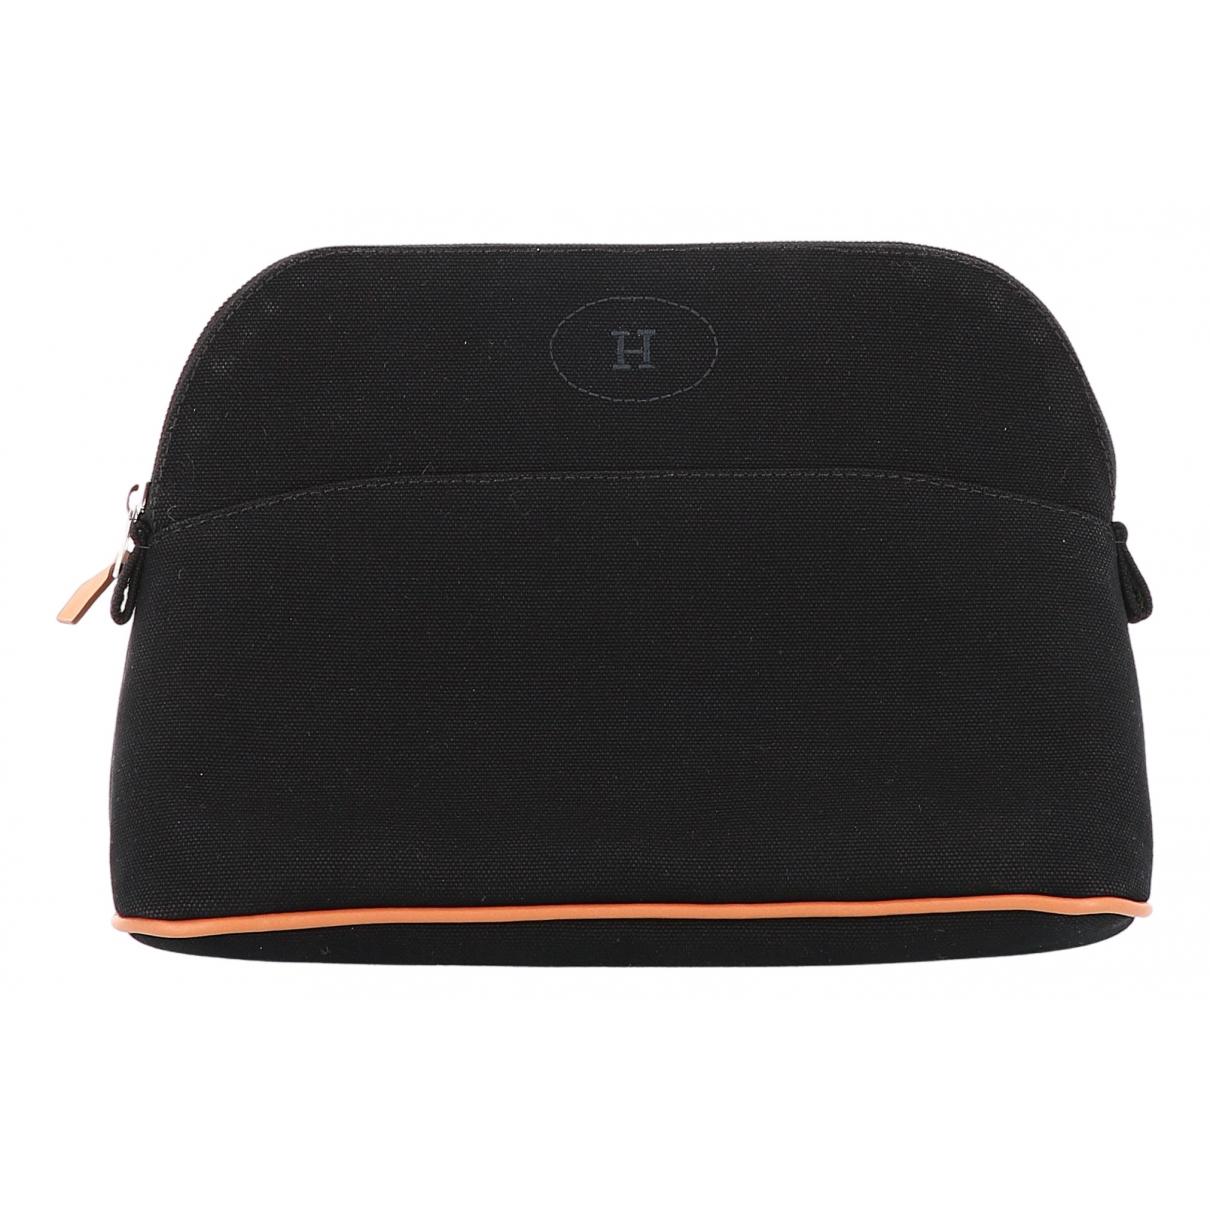 Hermès Bolide Black Cloth Travel bag for Women N